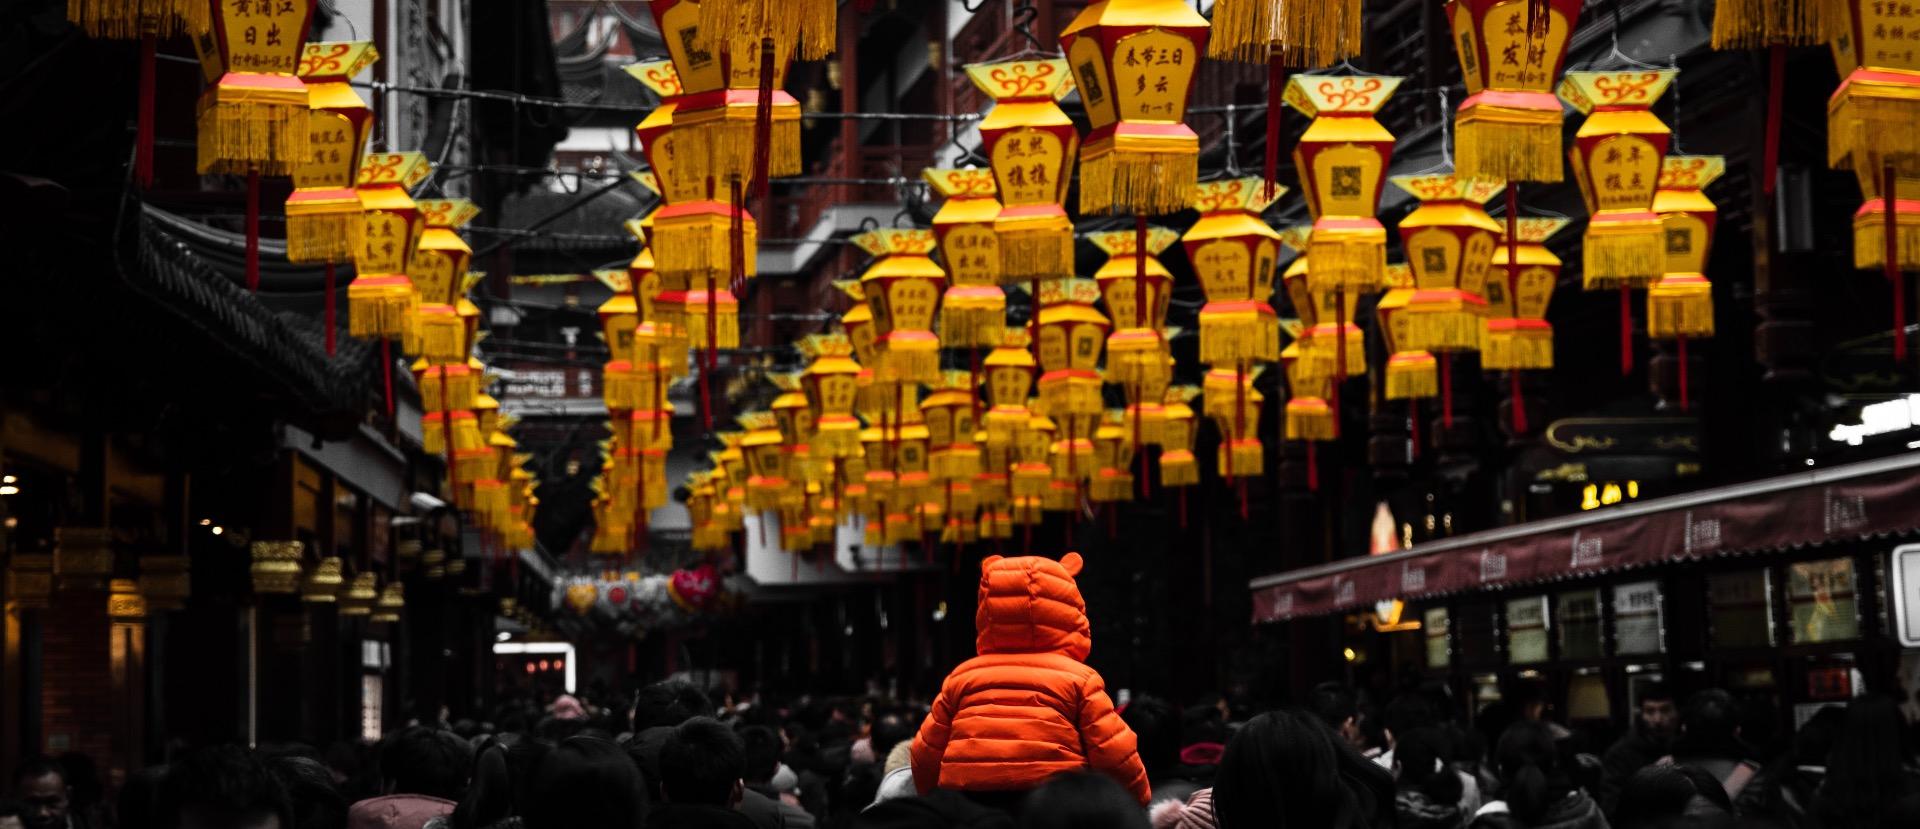 Child and lanterns